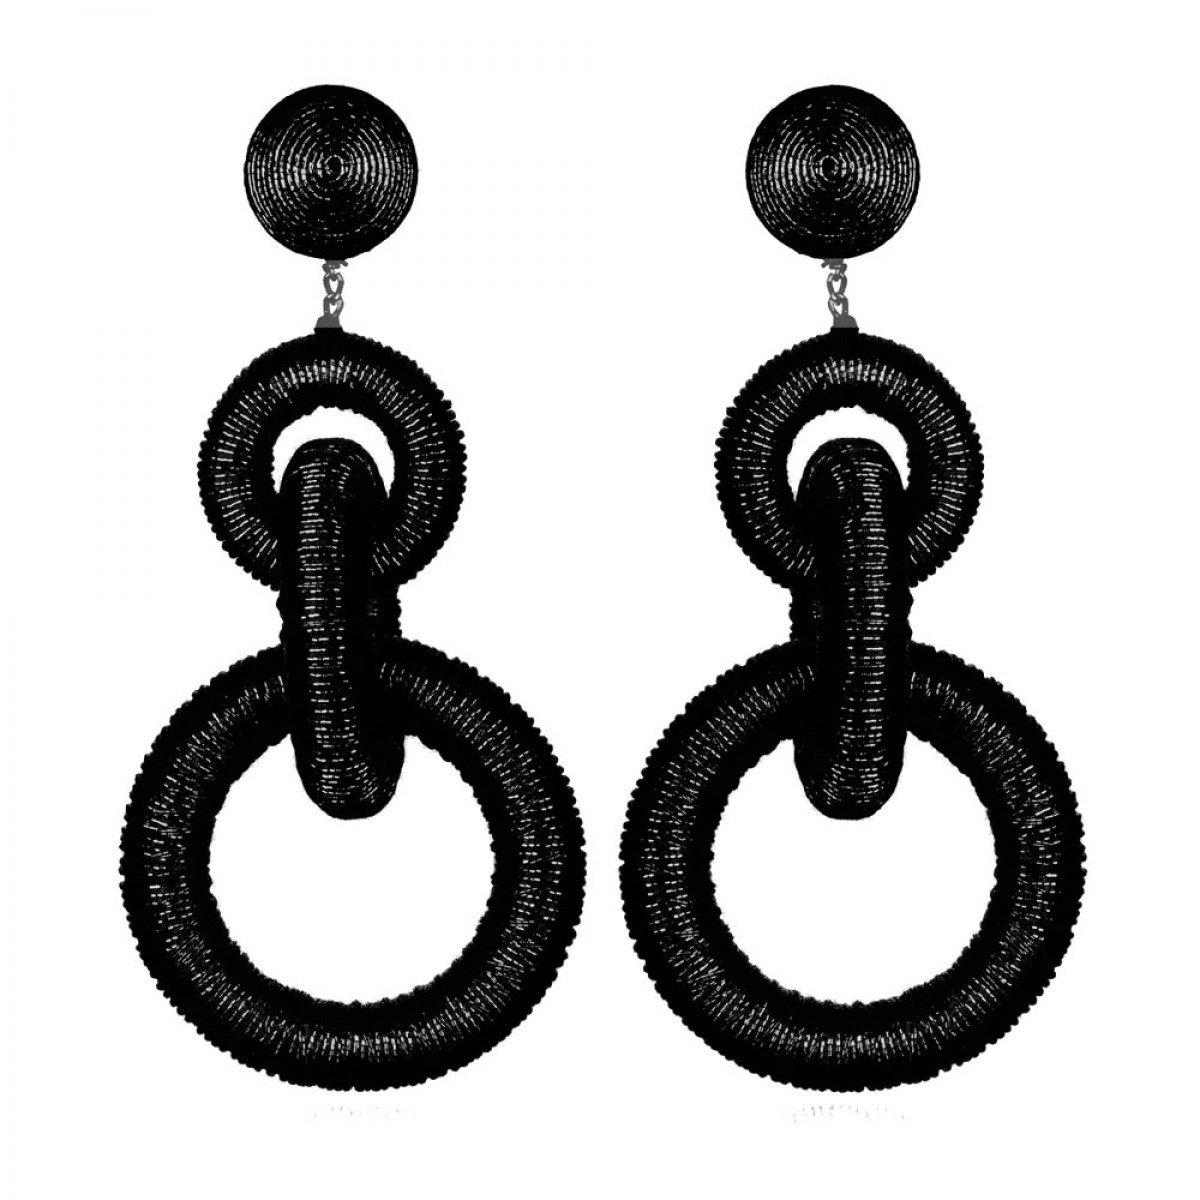 Black Three Tier Hoop Earrings by SUZANNA DAI